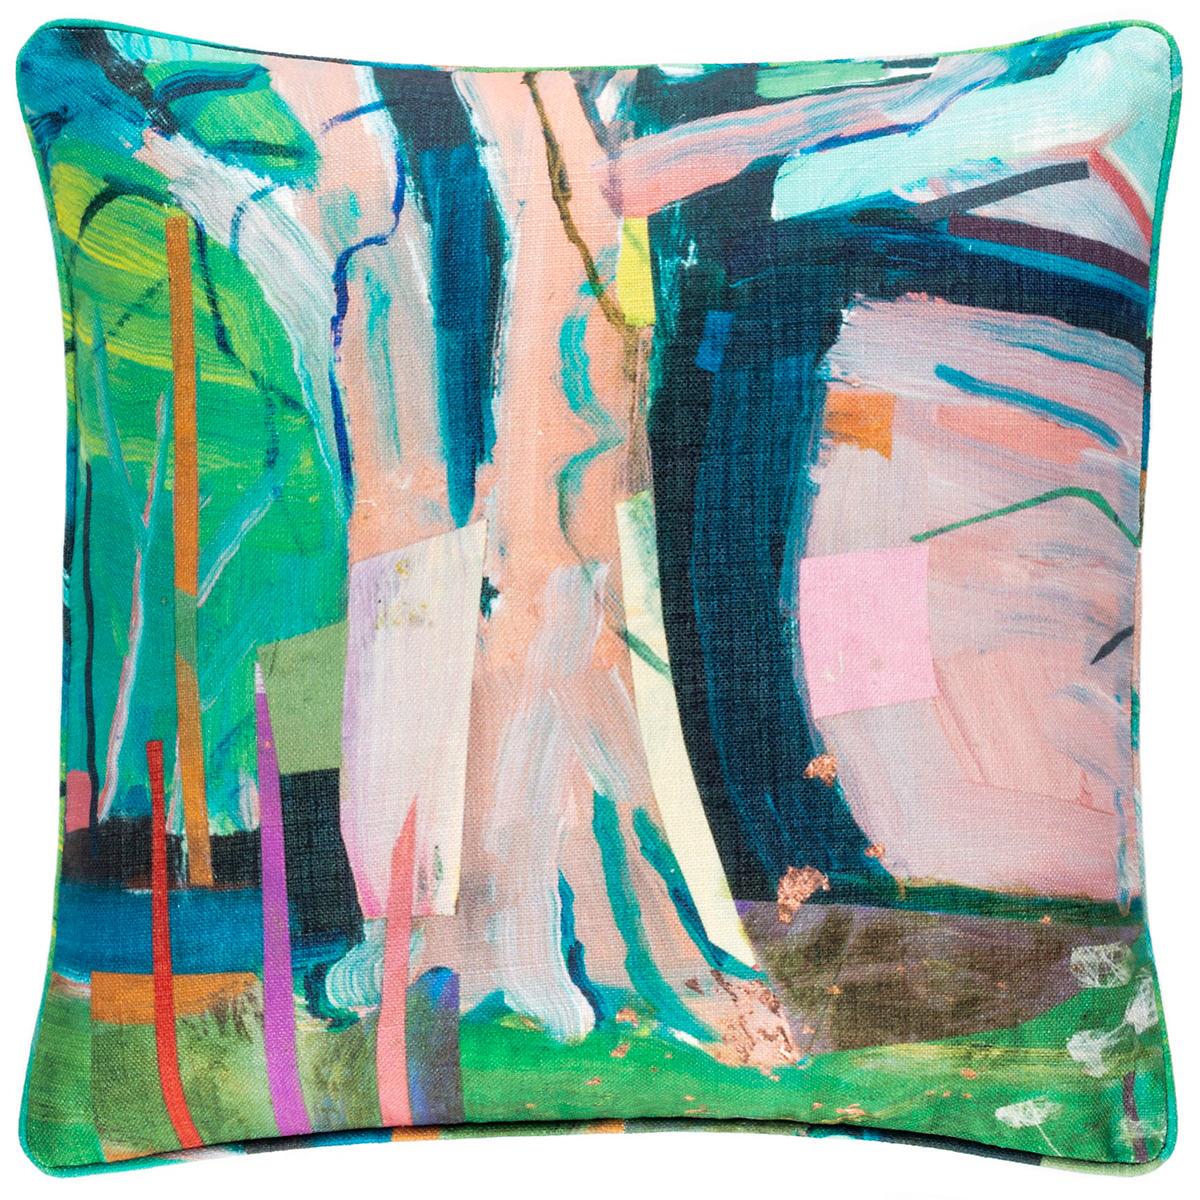 Queen Anne's Lace Indoor/Outdoor Decorative Pillow